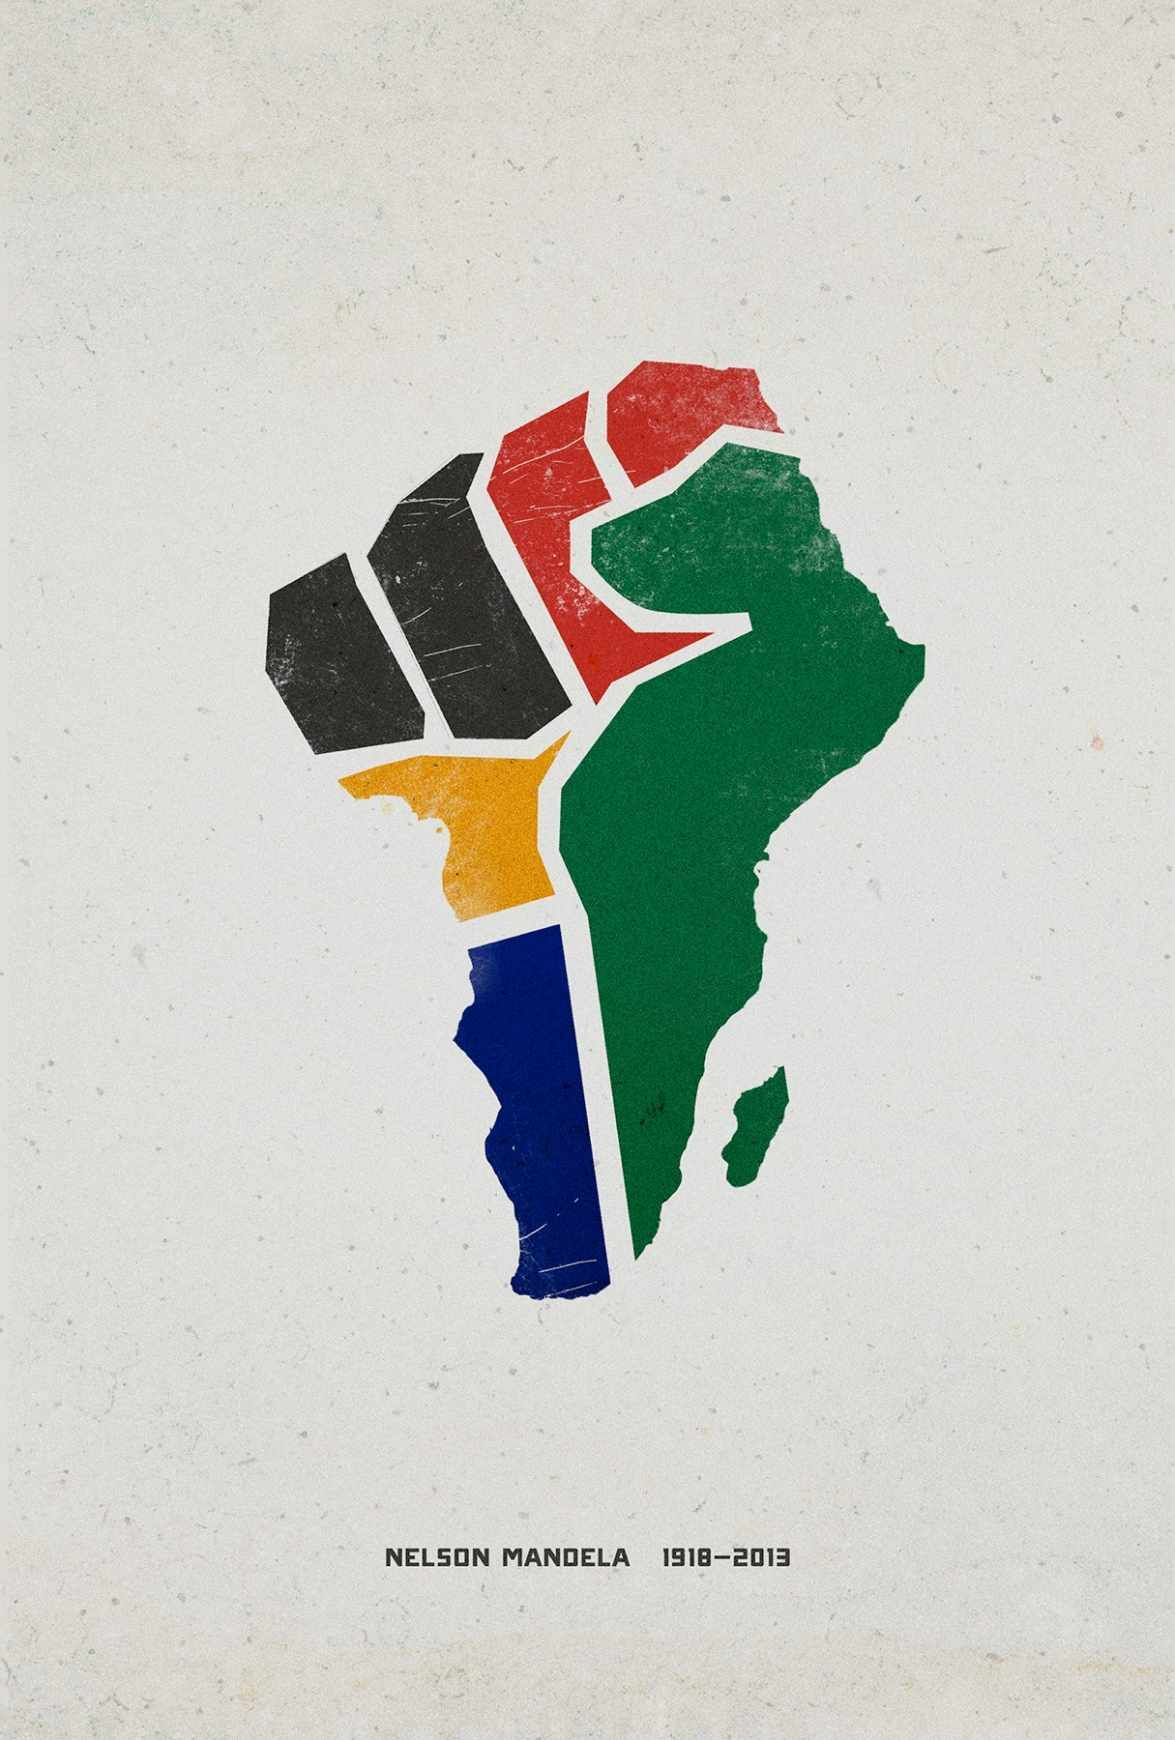 Mandela Tribute Fist Graphic design inspiration, Art